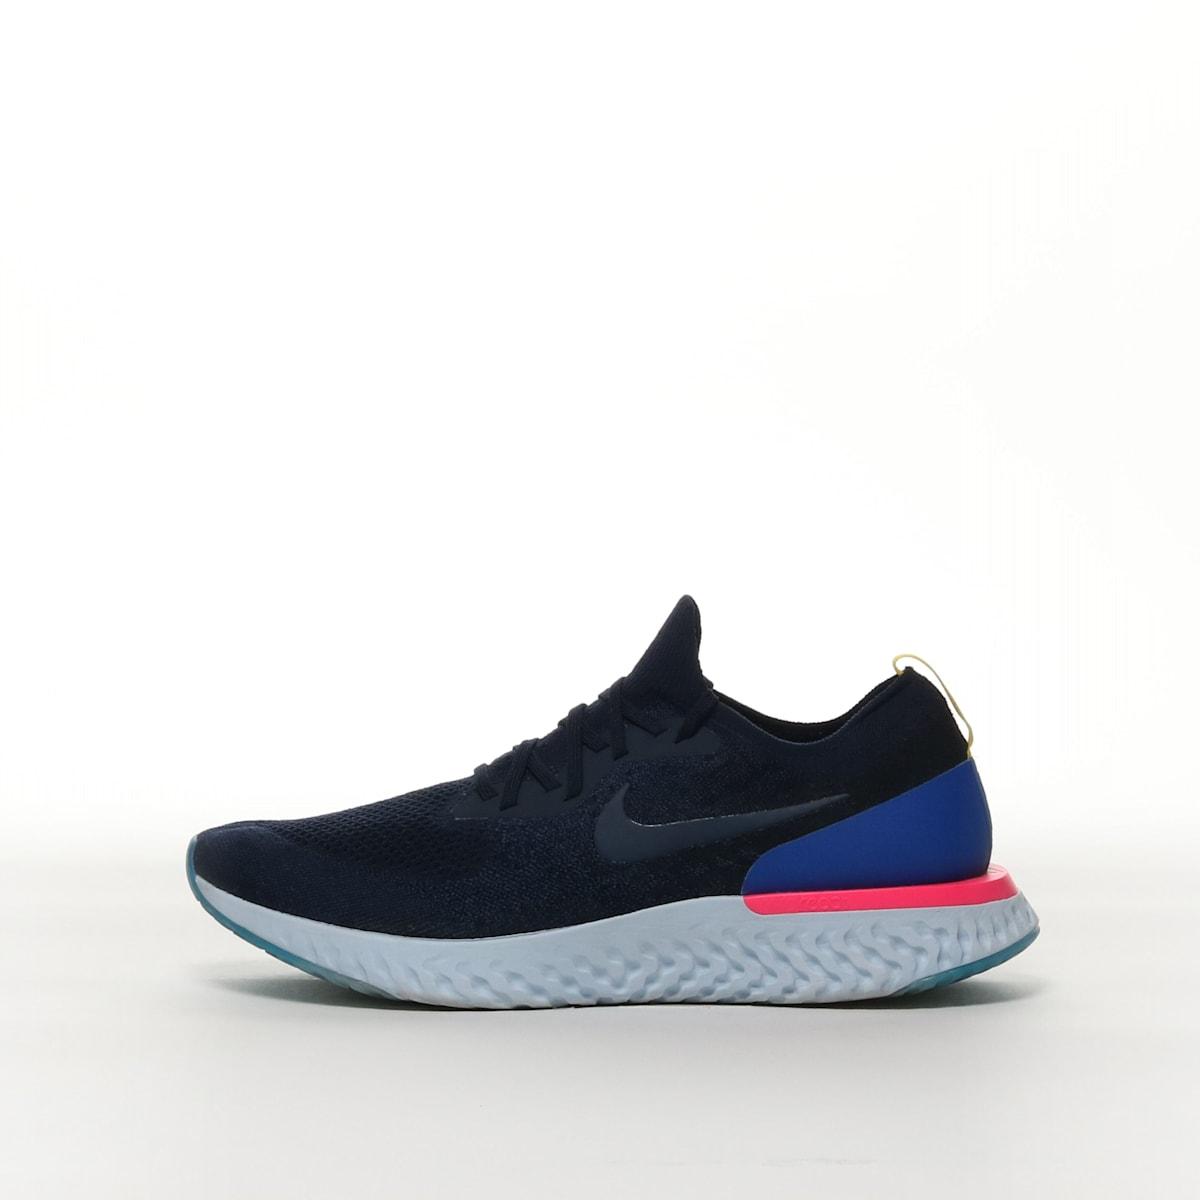 46eb8bb94d0 Nike Epic React Flyknit 1 - COLLEGE NAVY RACER BLUE PINK BLAST COLLEGE –  Resku